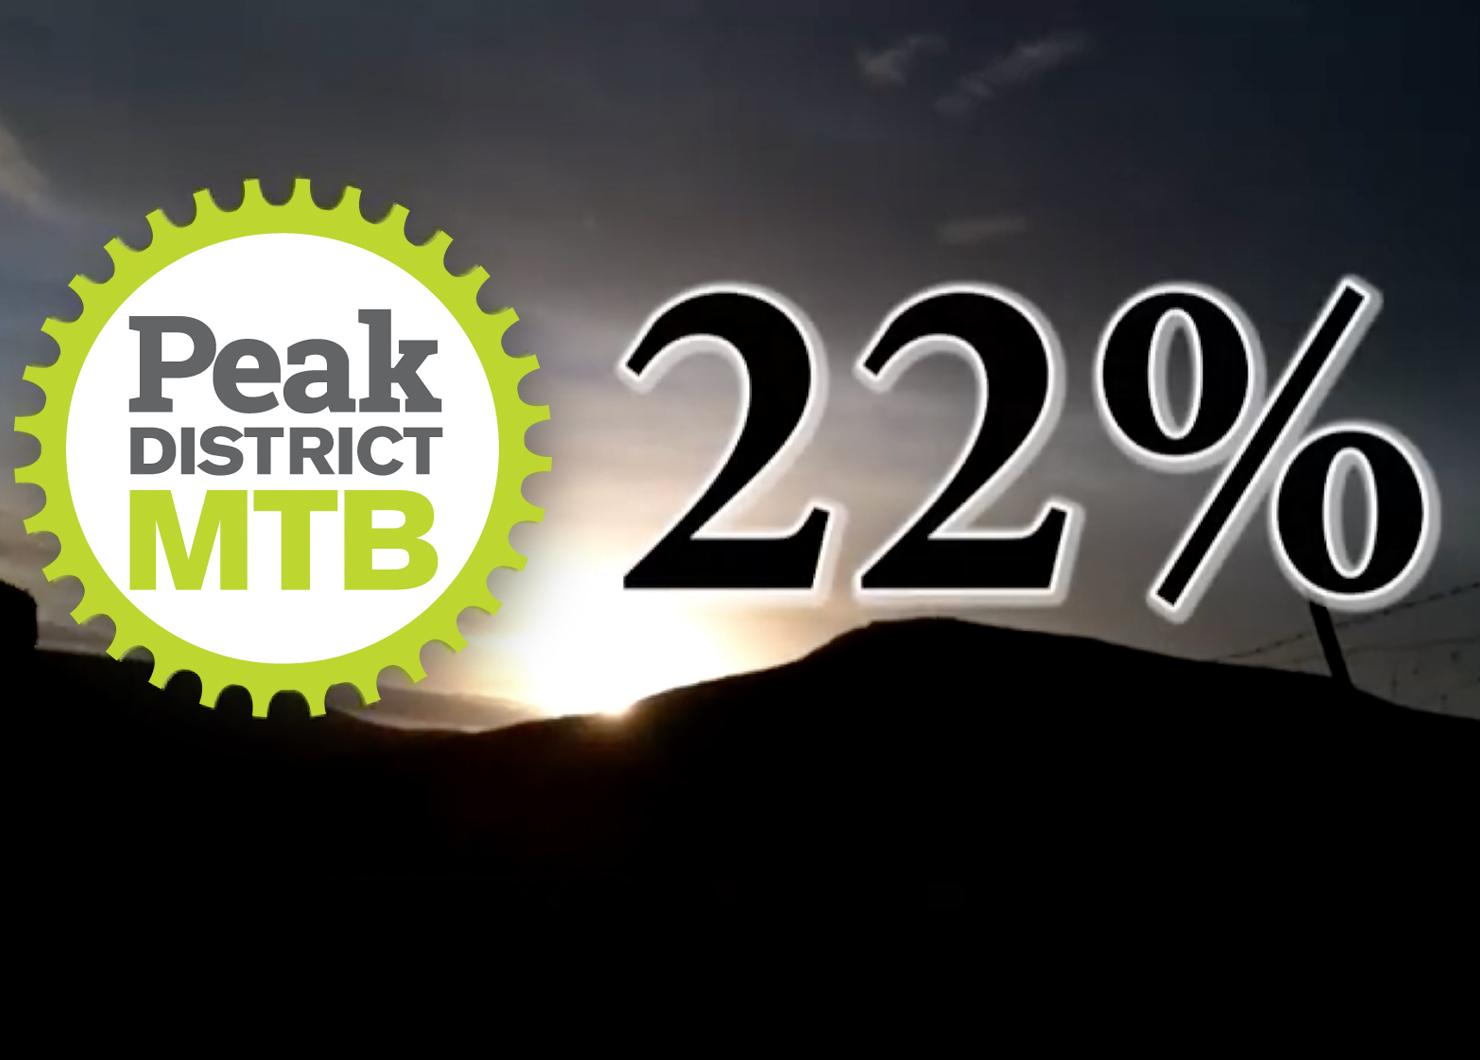 22% campaign Peak District MTB